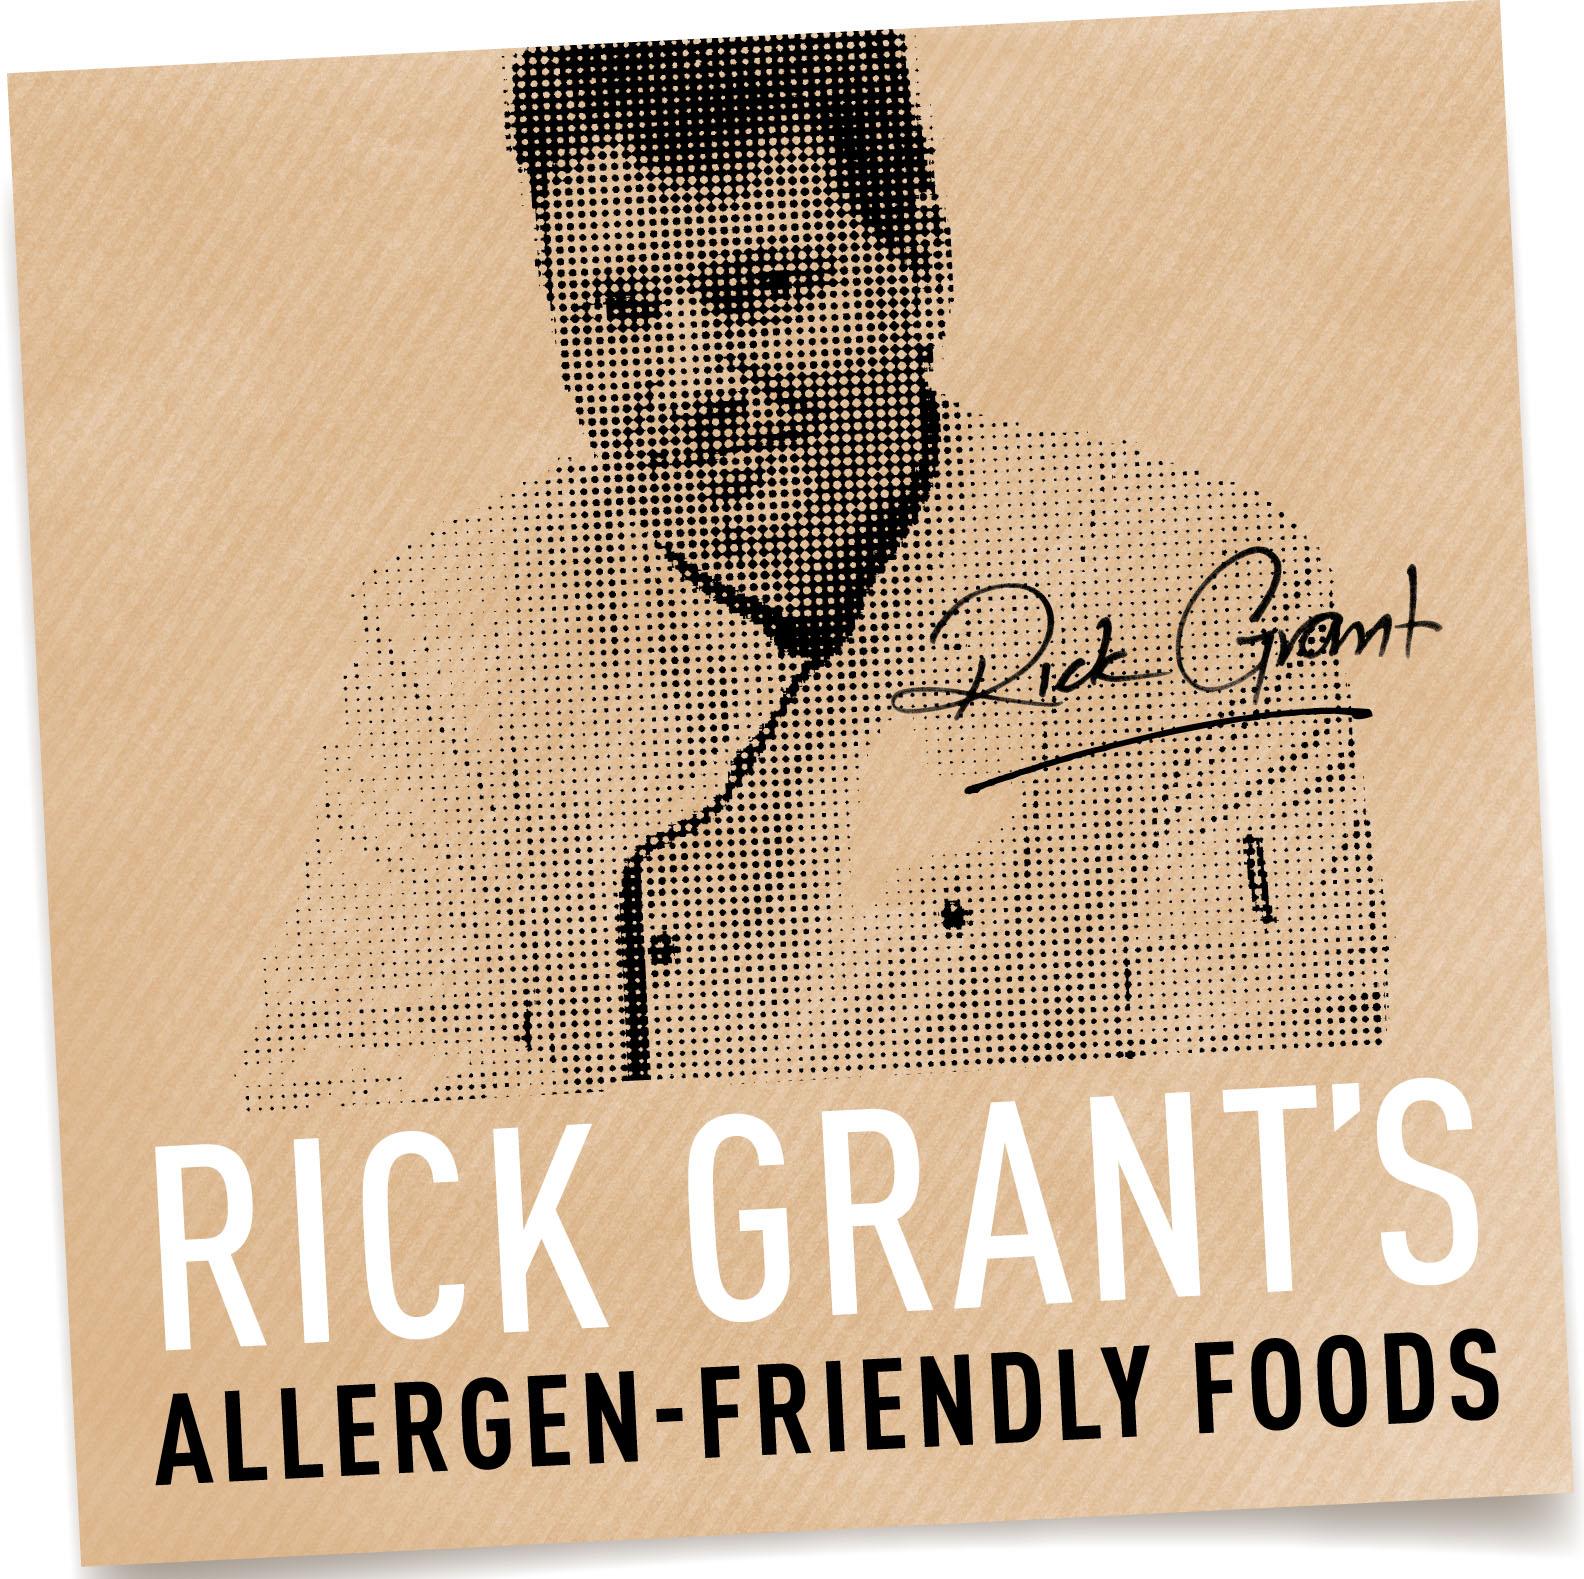 Rick Grant Logo-01 copy.jpg